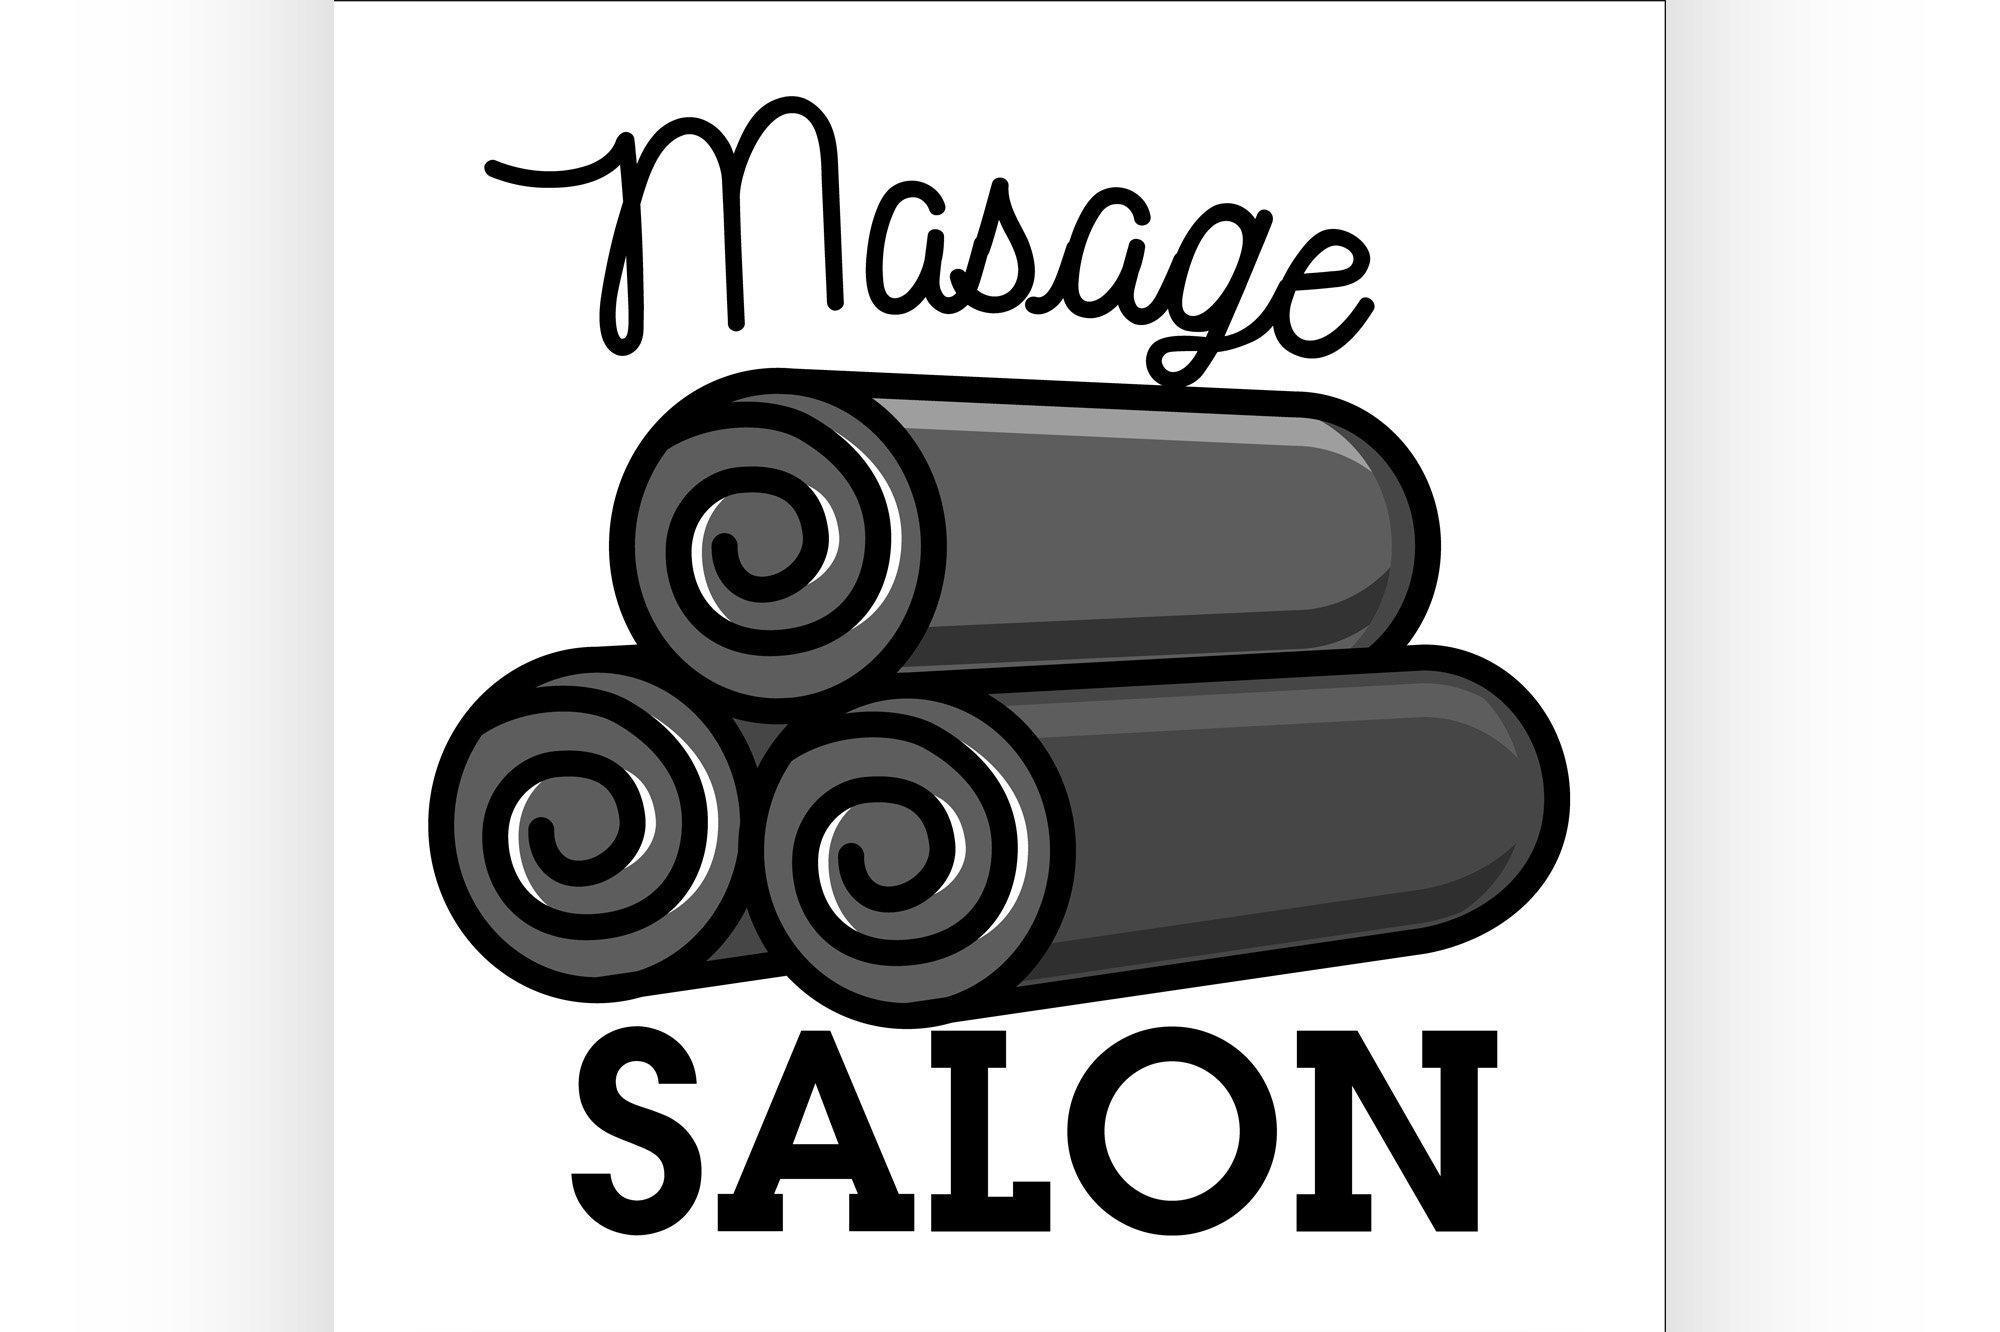 Color vintage massage salon emblem example image 1